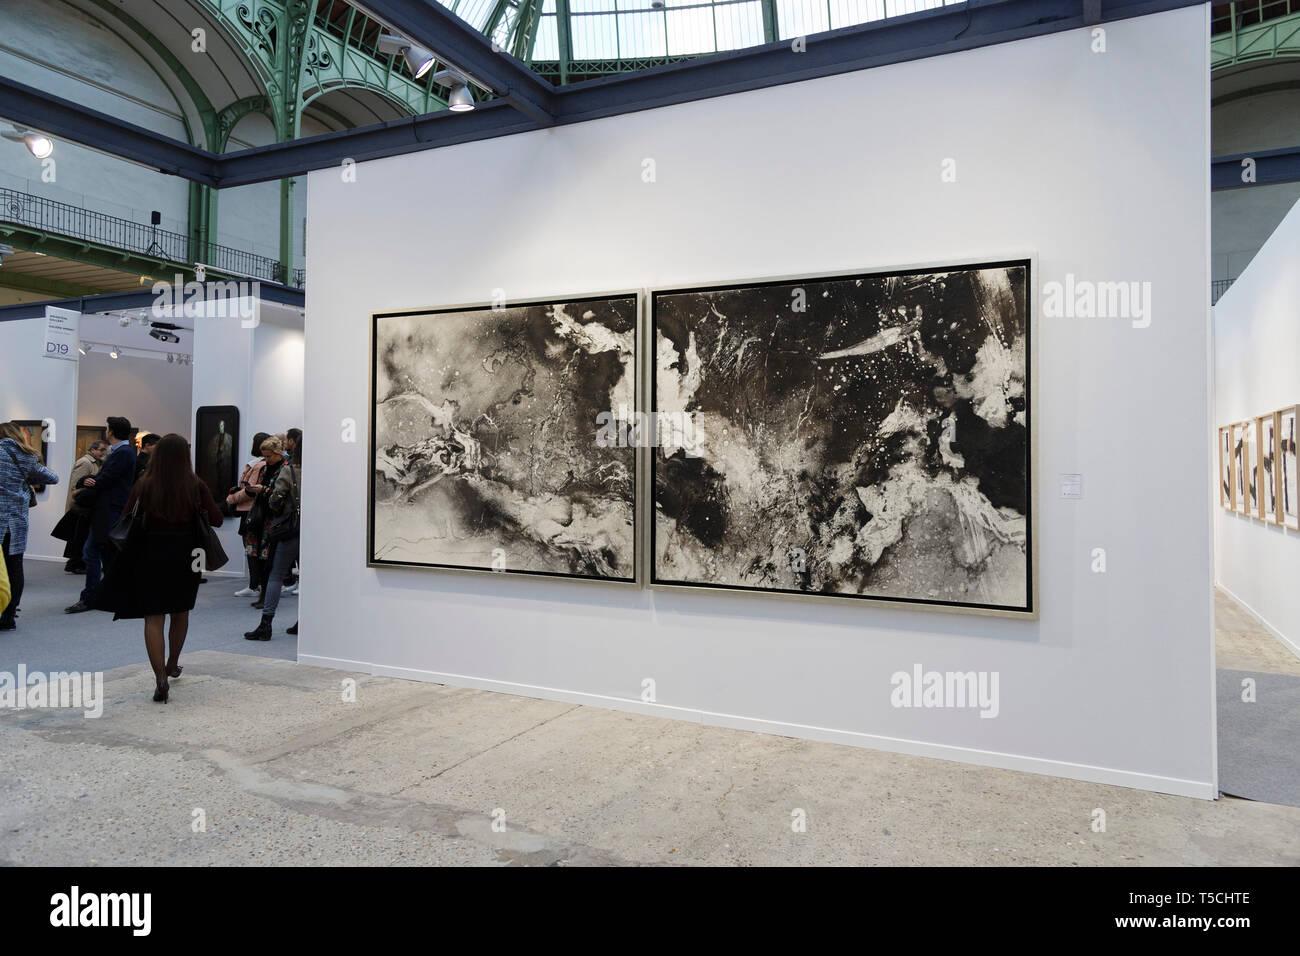 Paris, France. 3th April, 2019. Takehiko Sugawara exibited at Paris Art Fair, Paris, 2019, France. Credit: Veronique Phitoussi/Alamy Stock Photo Stock Photo